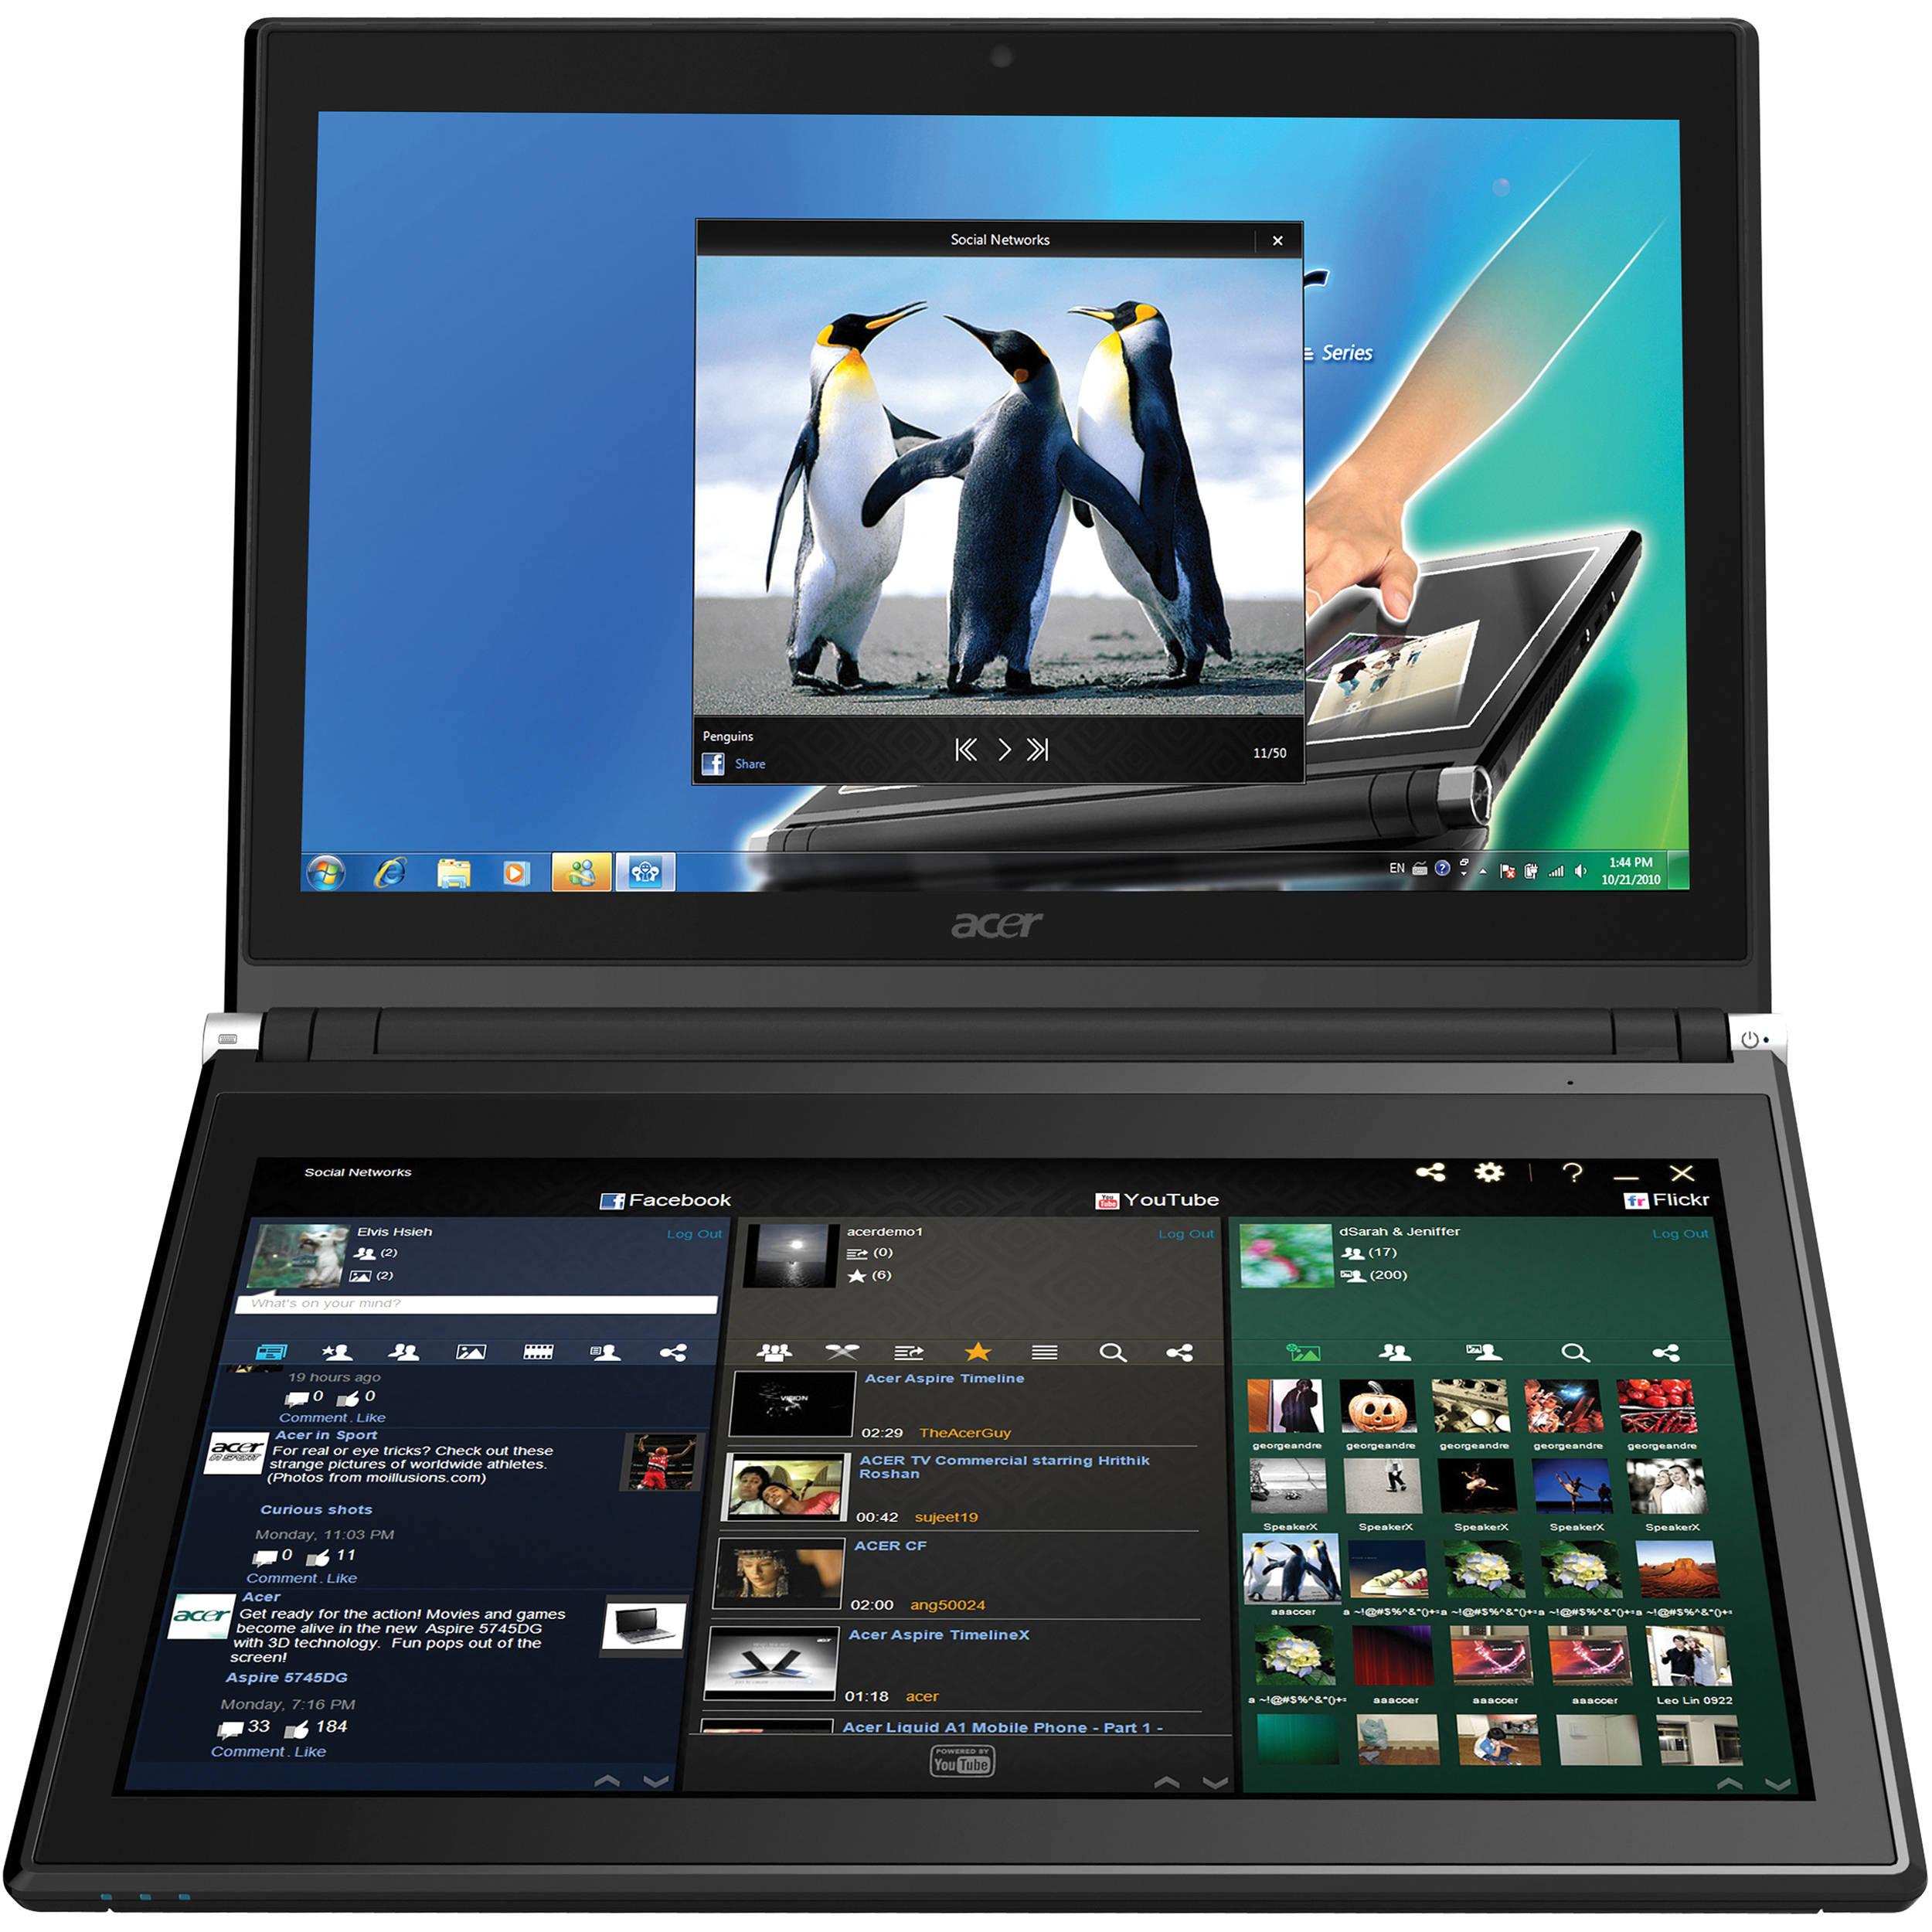 Acer Iconia: Dual-Display Laptop